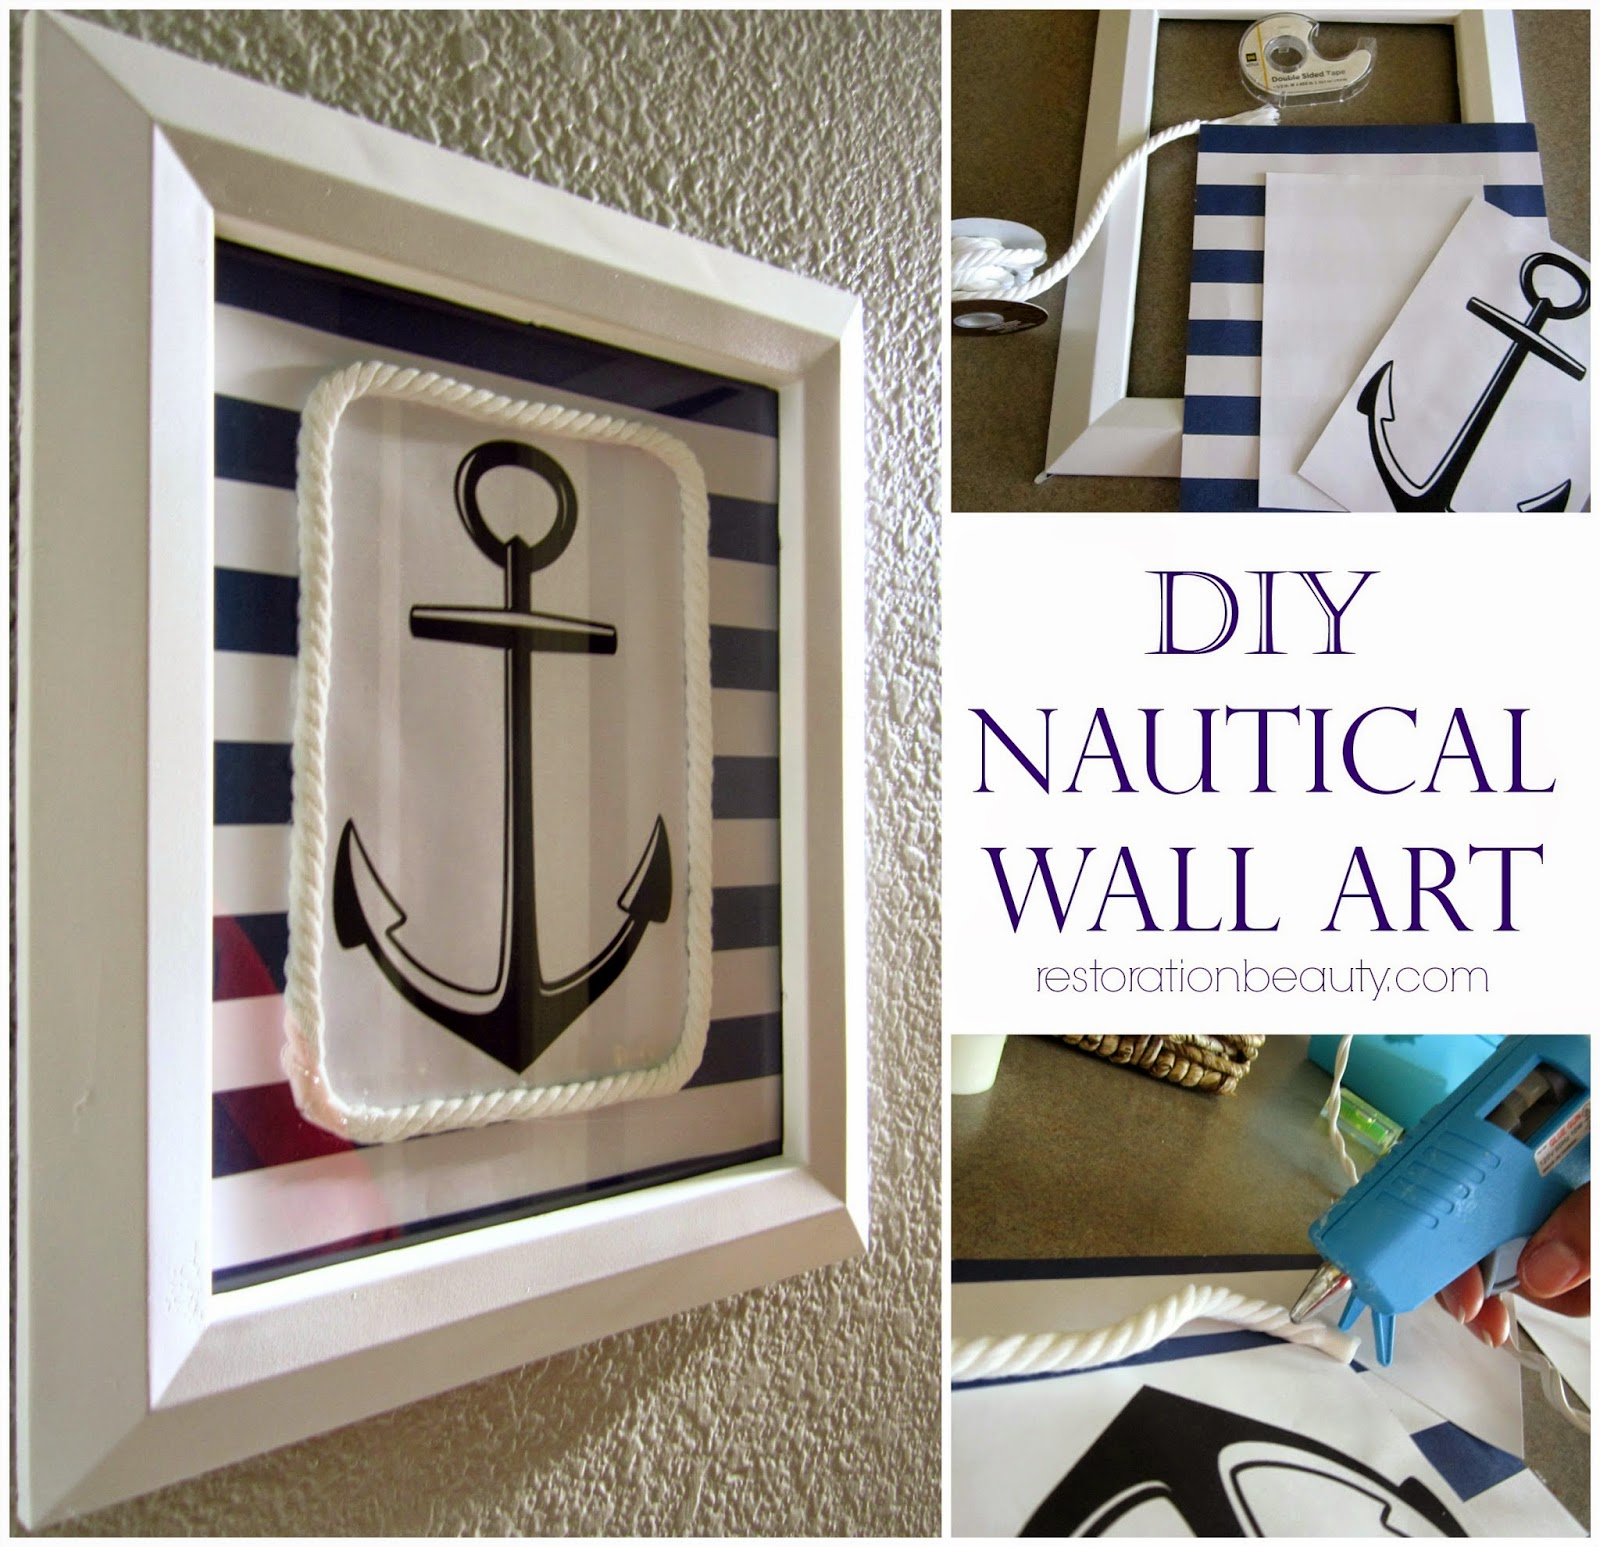 Home Made Wall Decor: Restoration Beauty: DIY Nautical Wall Art